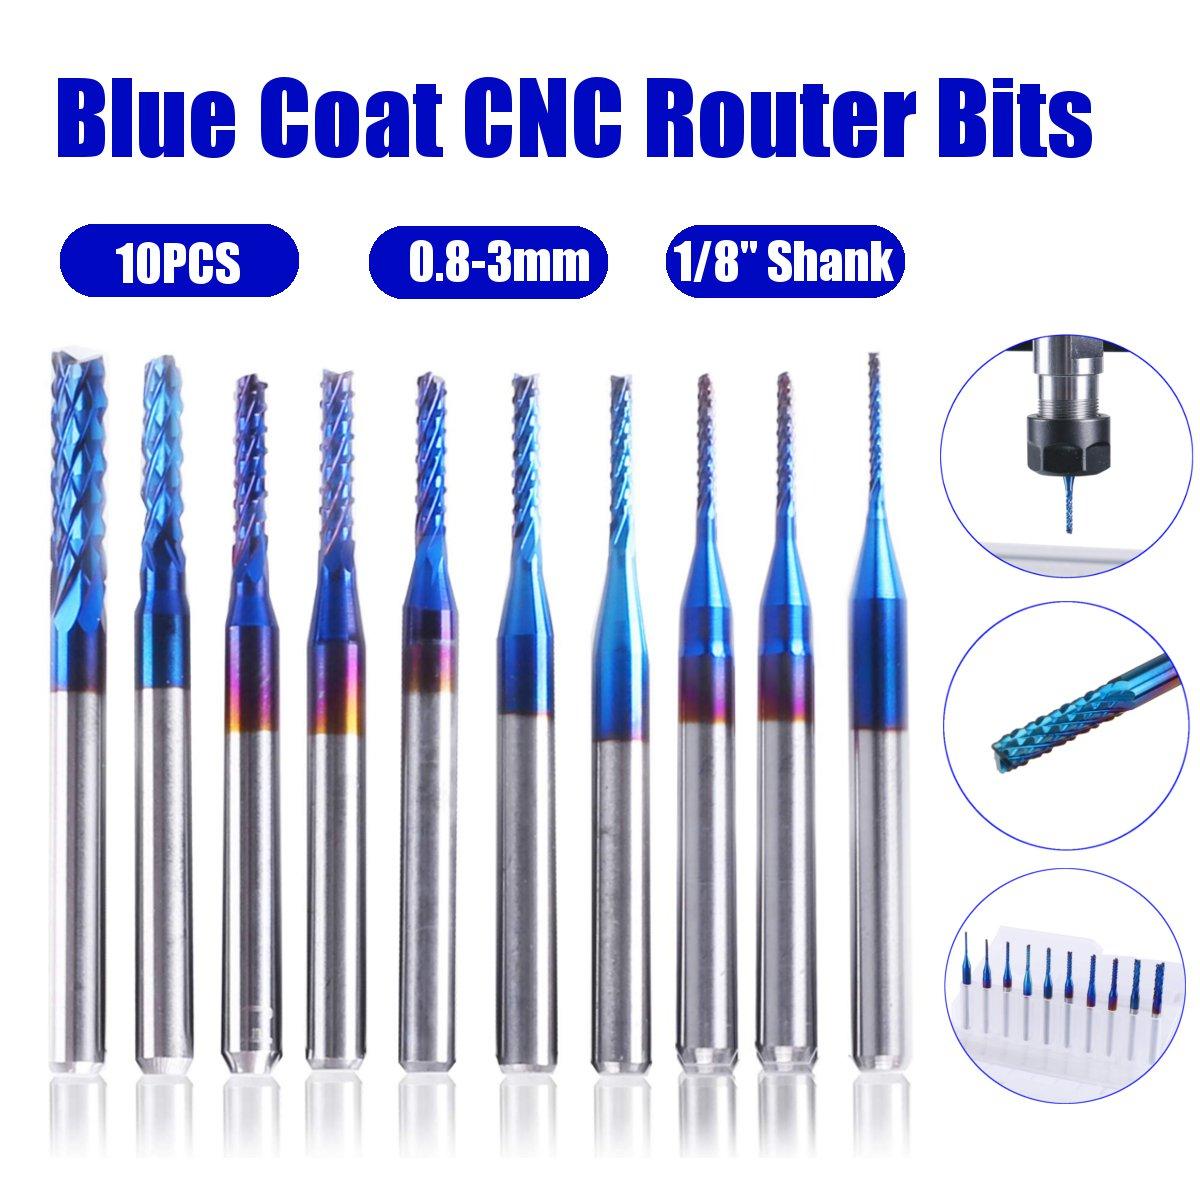 10 unidades, fresa de grabado NaCoating azul de 0,8-3mm, fresa de extremo de carburo, fresas de enrutador CNC de 1/8 pulgadas, herramienta de enrutador de vástago